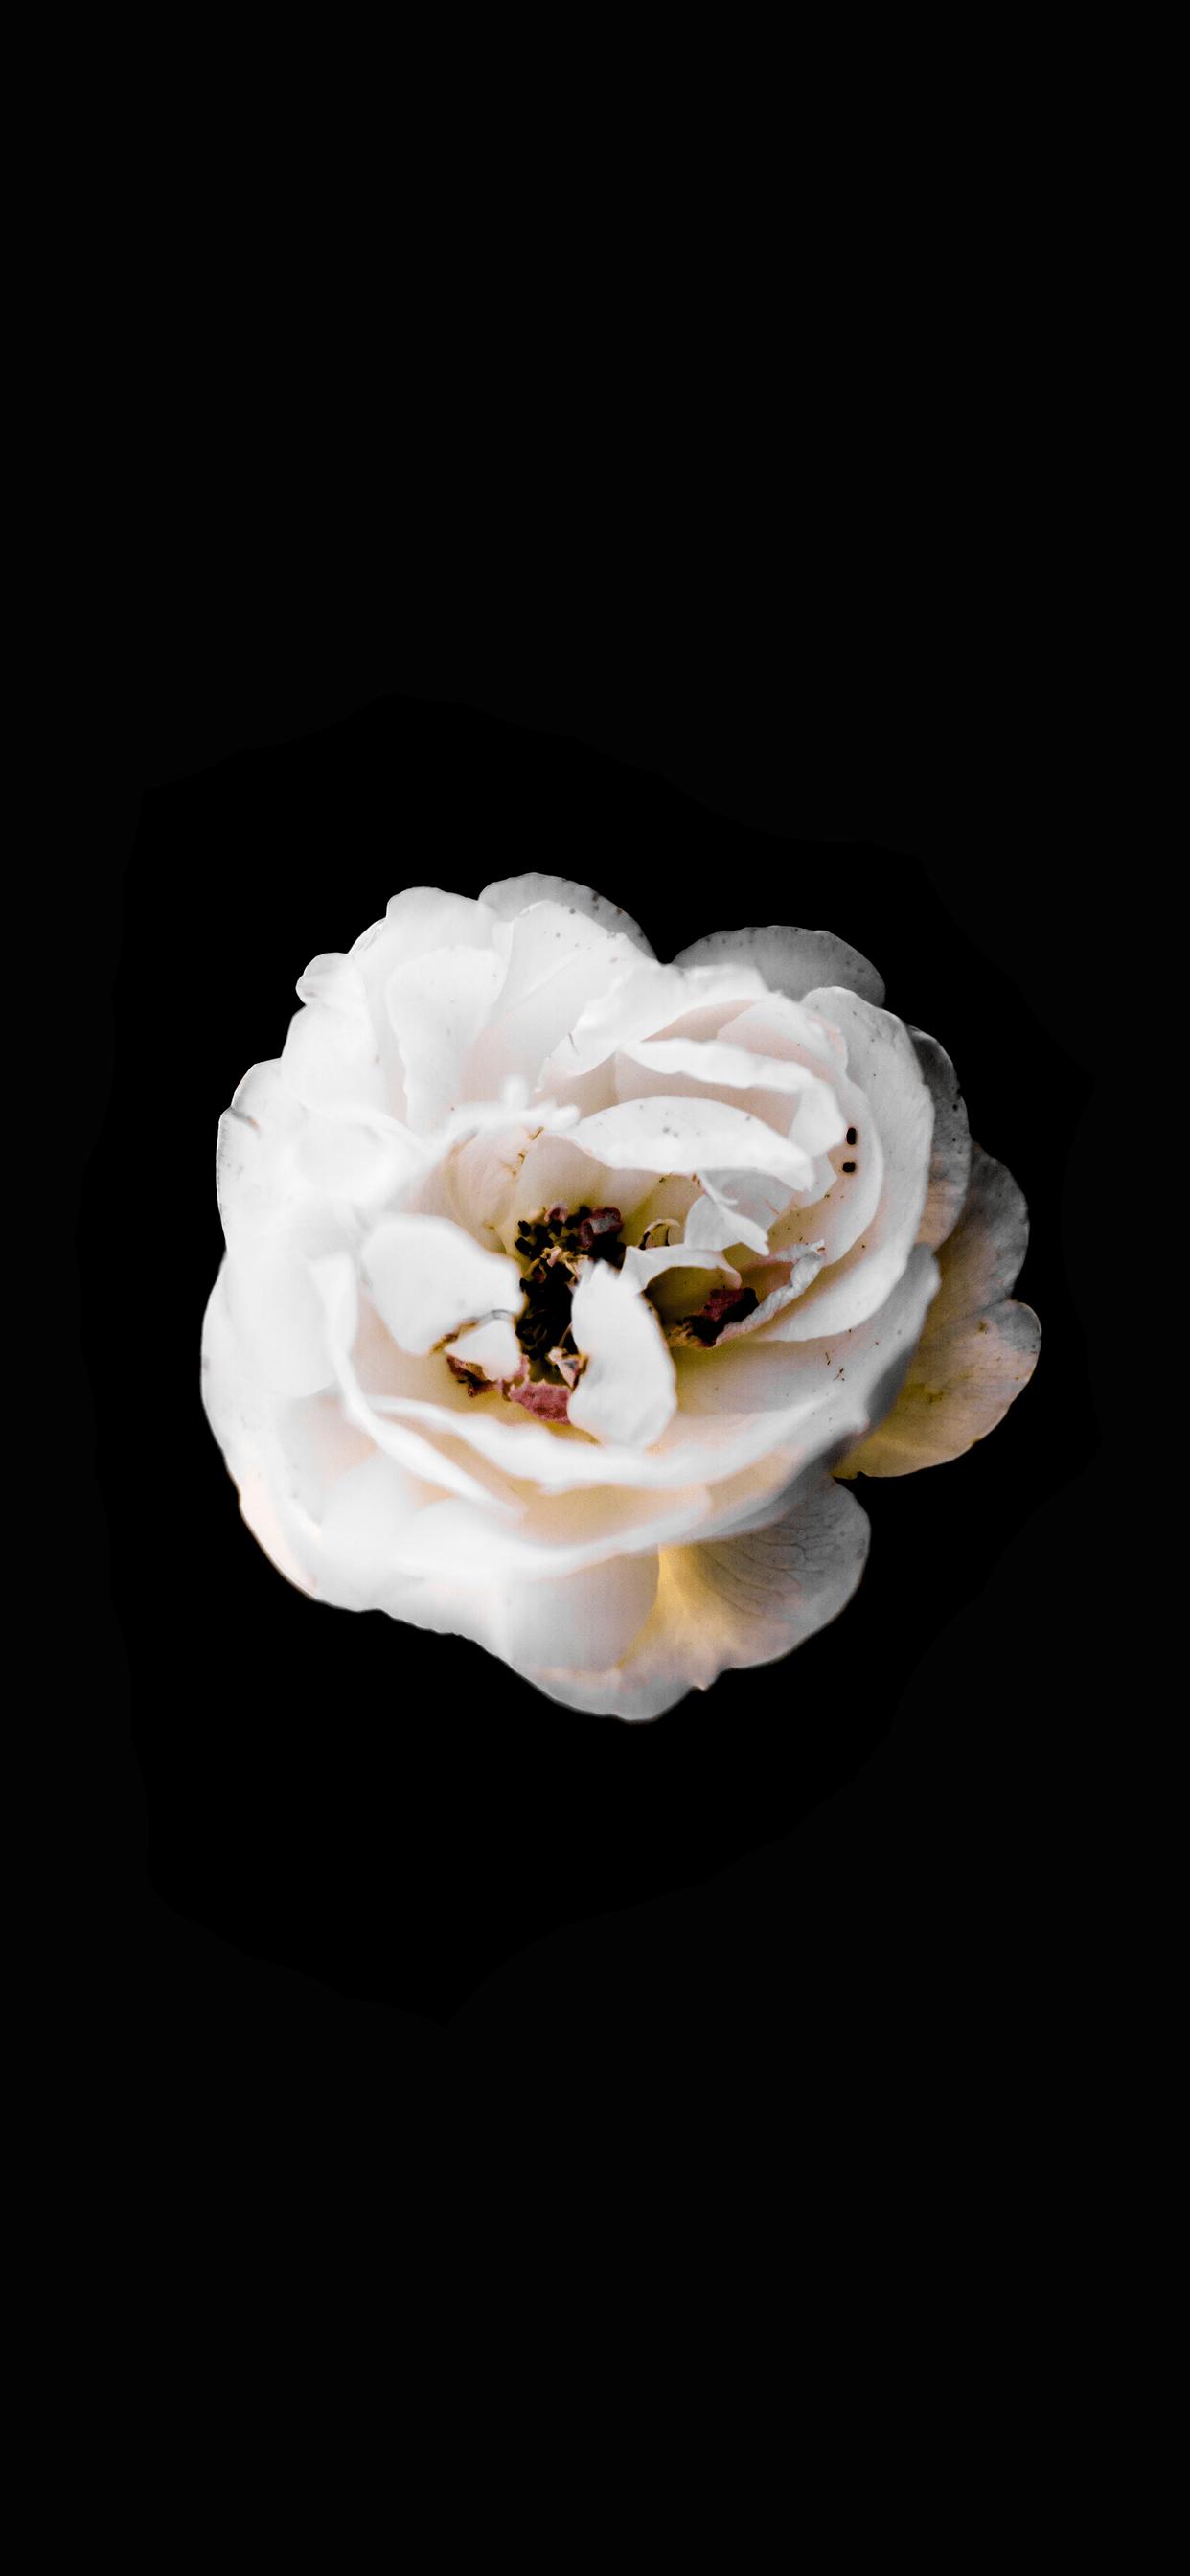 iPhone wallpaper black background flower Black